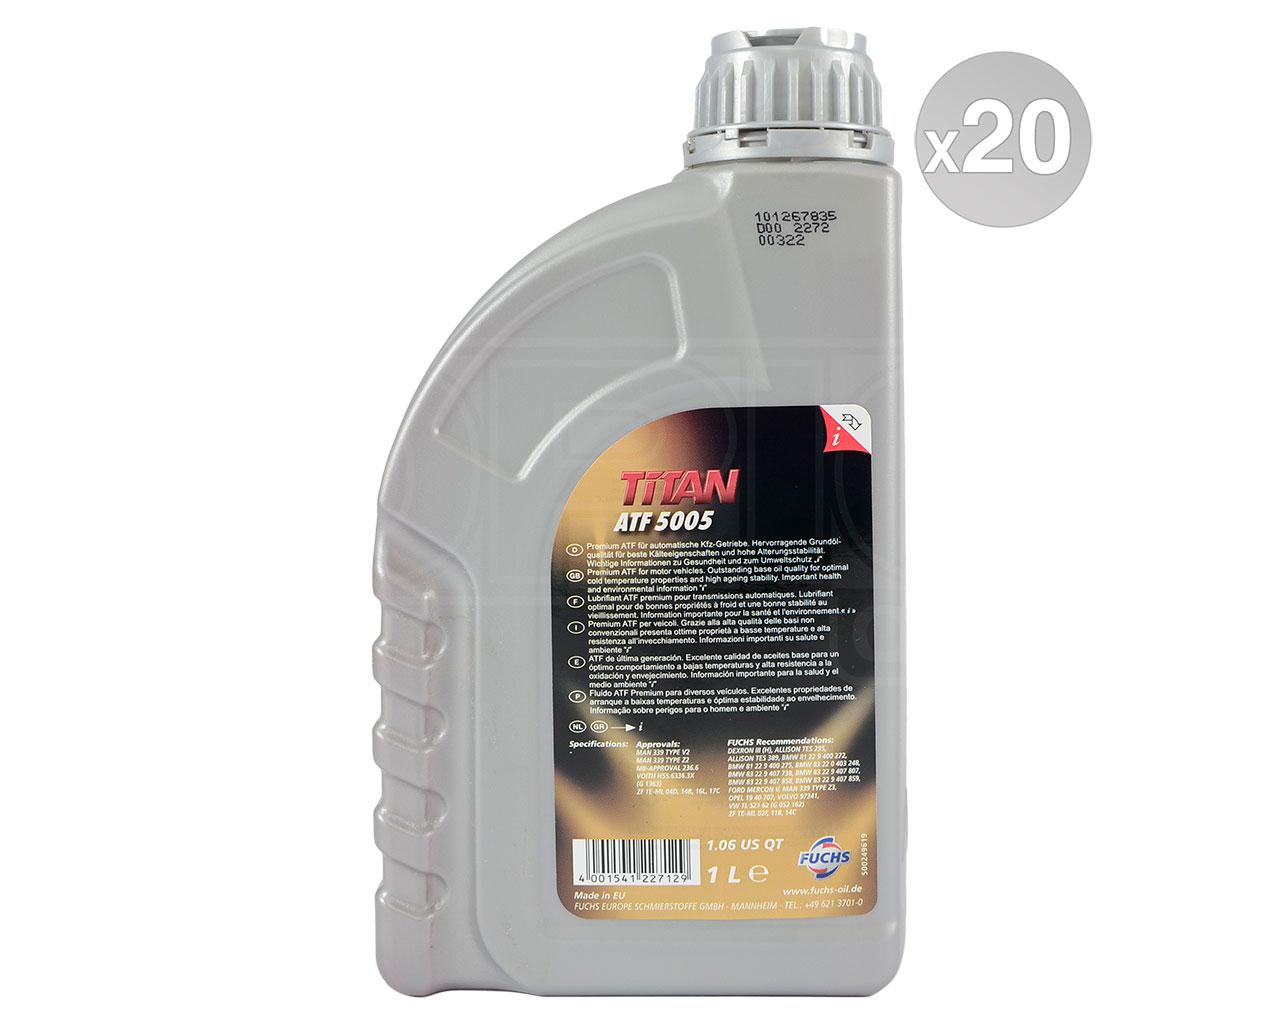 Fuchs TITAN ATF 5005 Automatic Transmission Fluid